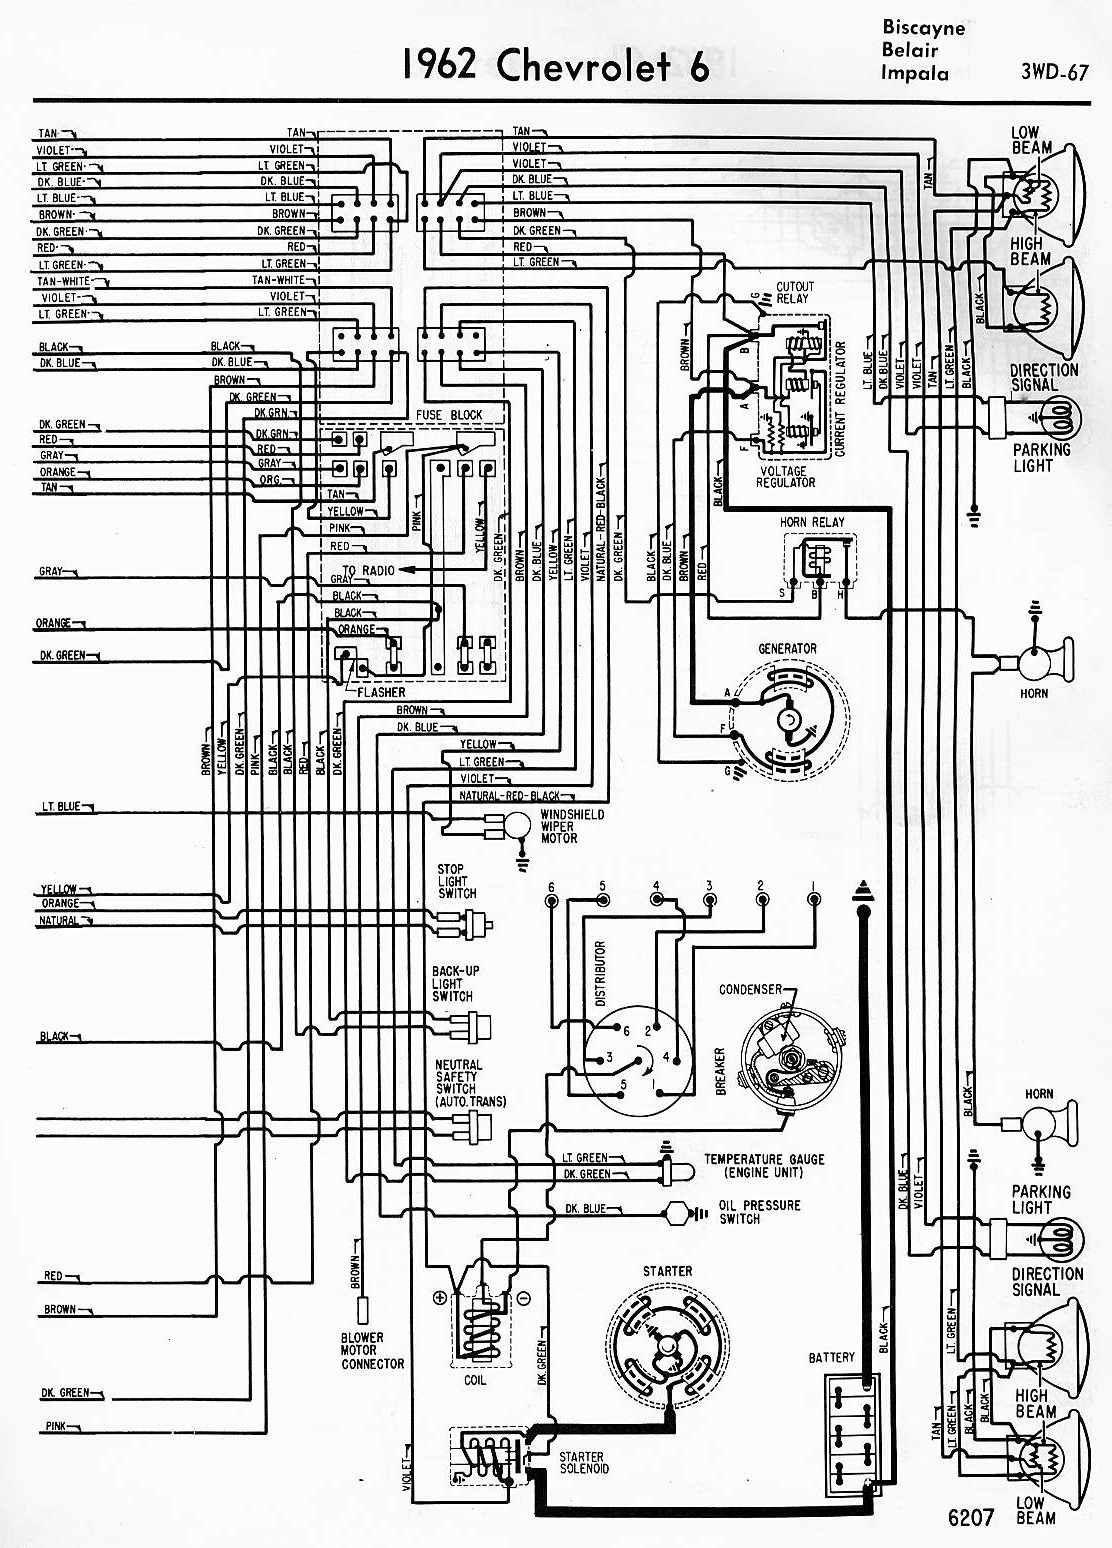 Diagram Pa Inte Wiring Diagram Full Version Hd Quality Wiring Diagram Tvdiagram Hosteria87 It